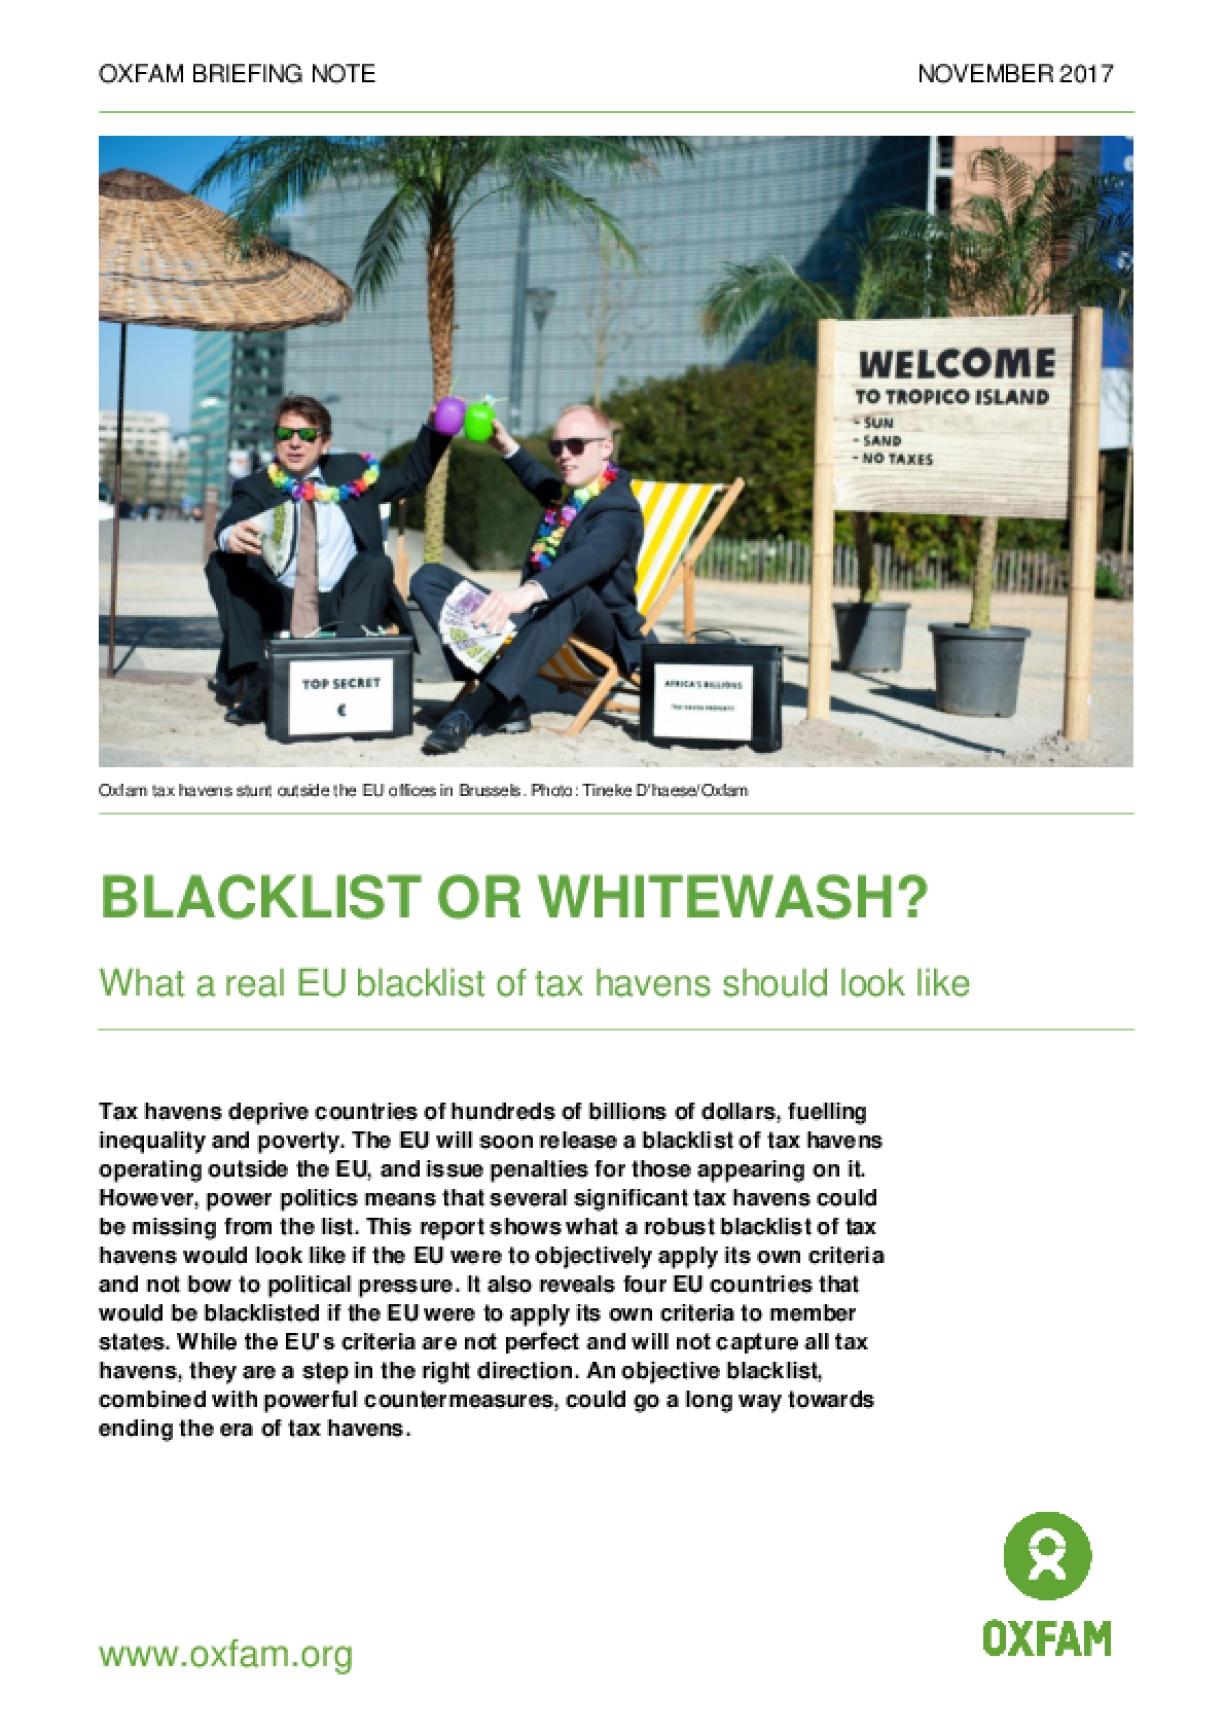 Blacklist or Whitewash? What a Real EU Blacklist of Tax Havens Should Look Like